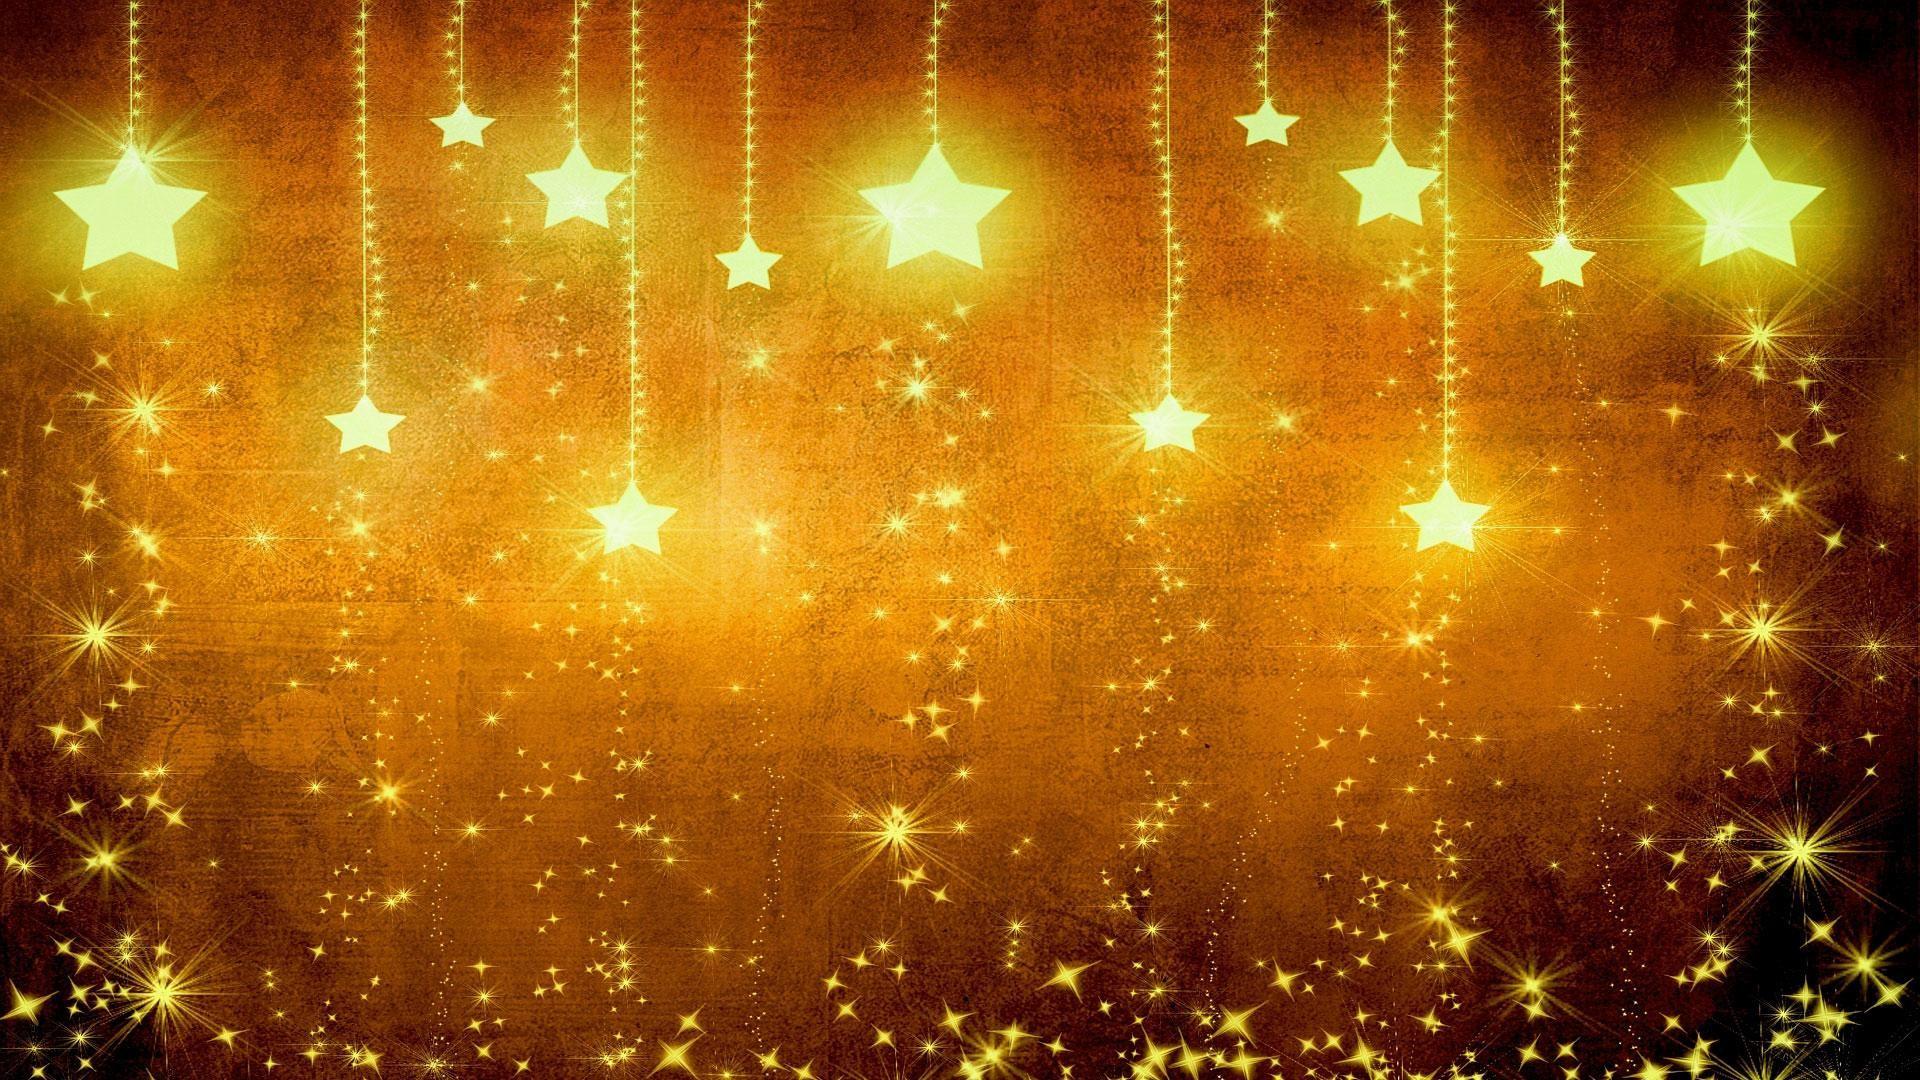 Gold-Glitter-Wallpaper-For-Computer